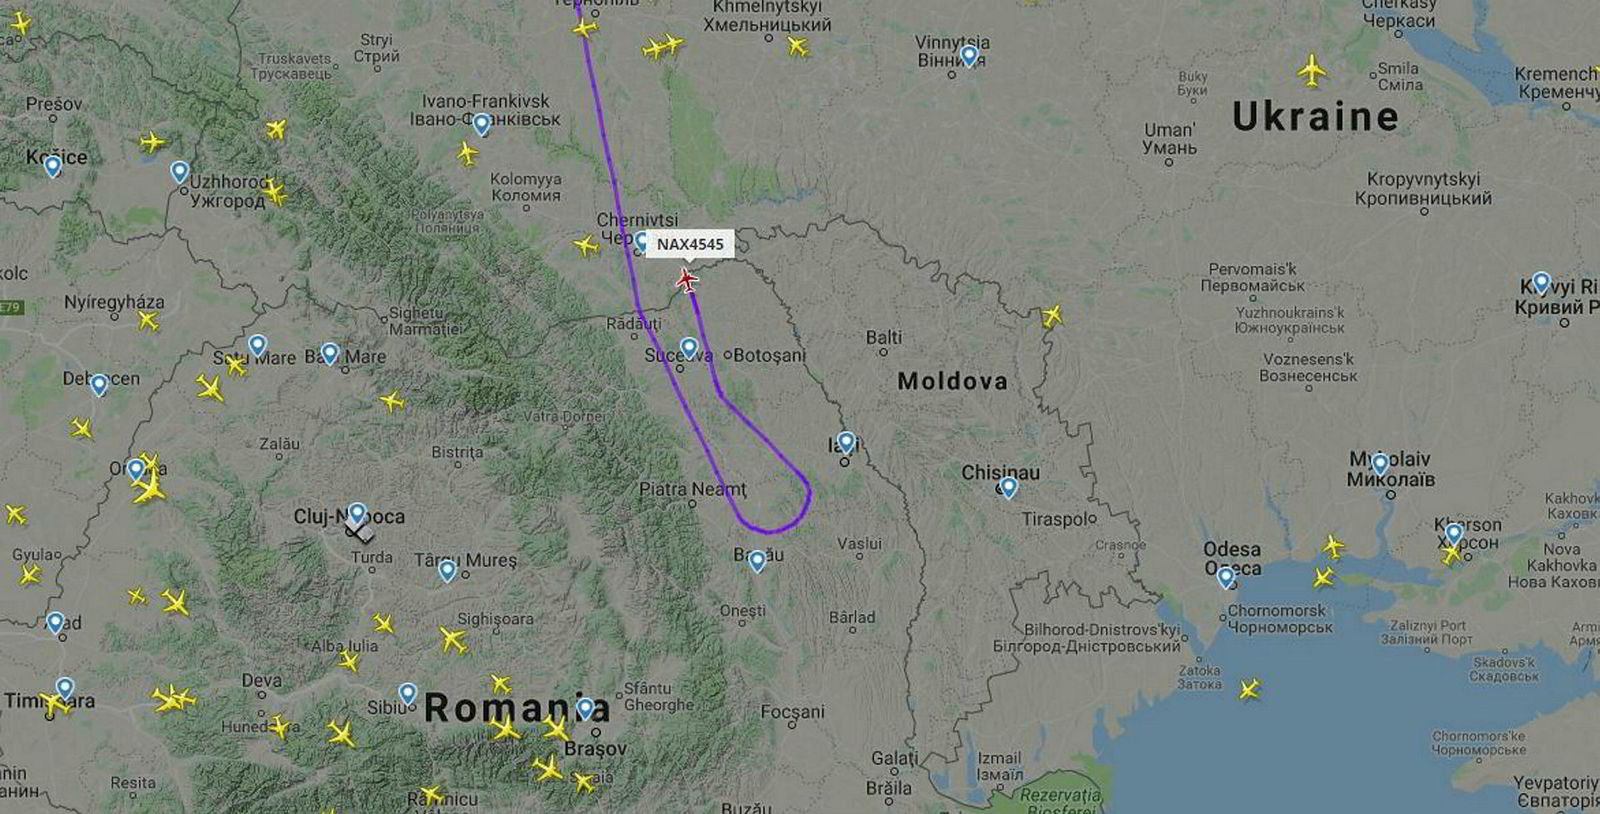 Flyvning DY4545 fra Stockholm til Tel Aviv snudde tirsdag ettermiddag og fløy nordover tilbake til Stockholm